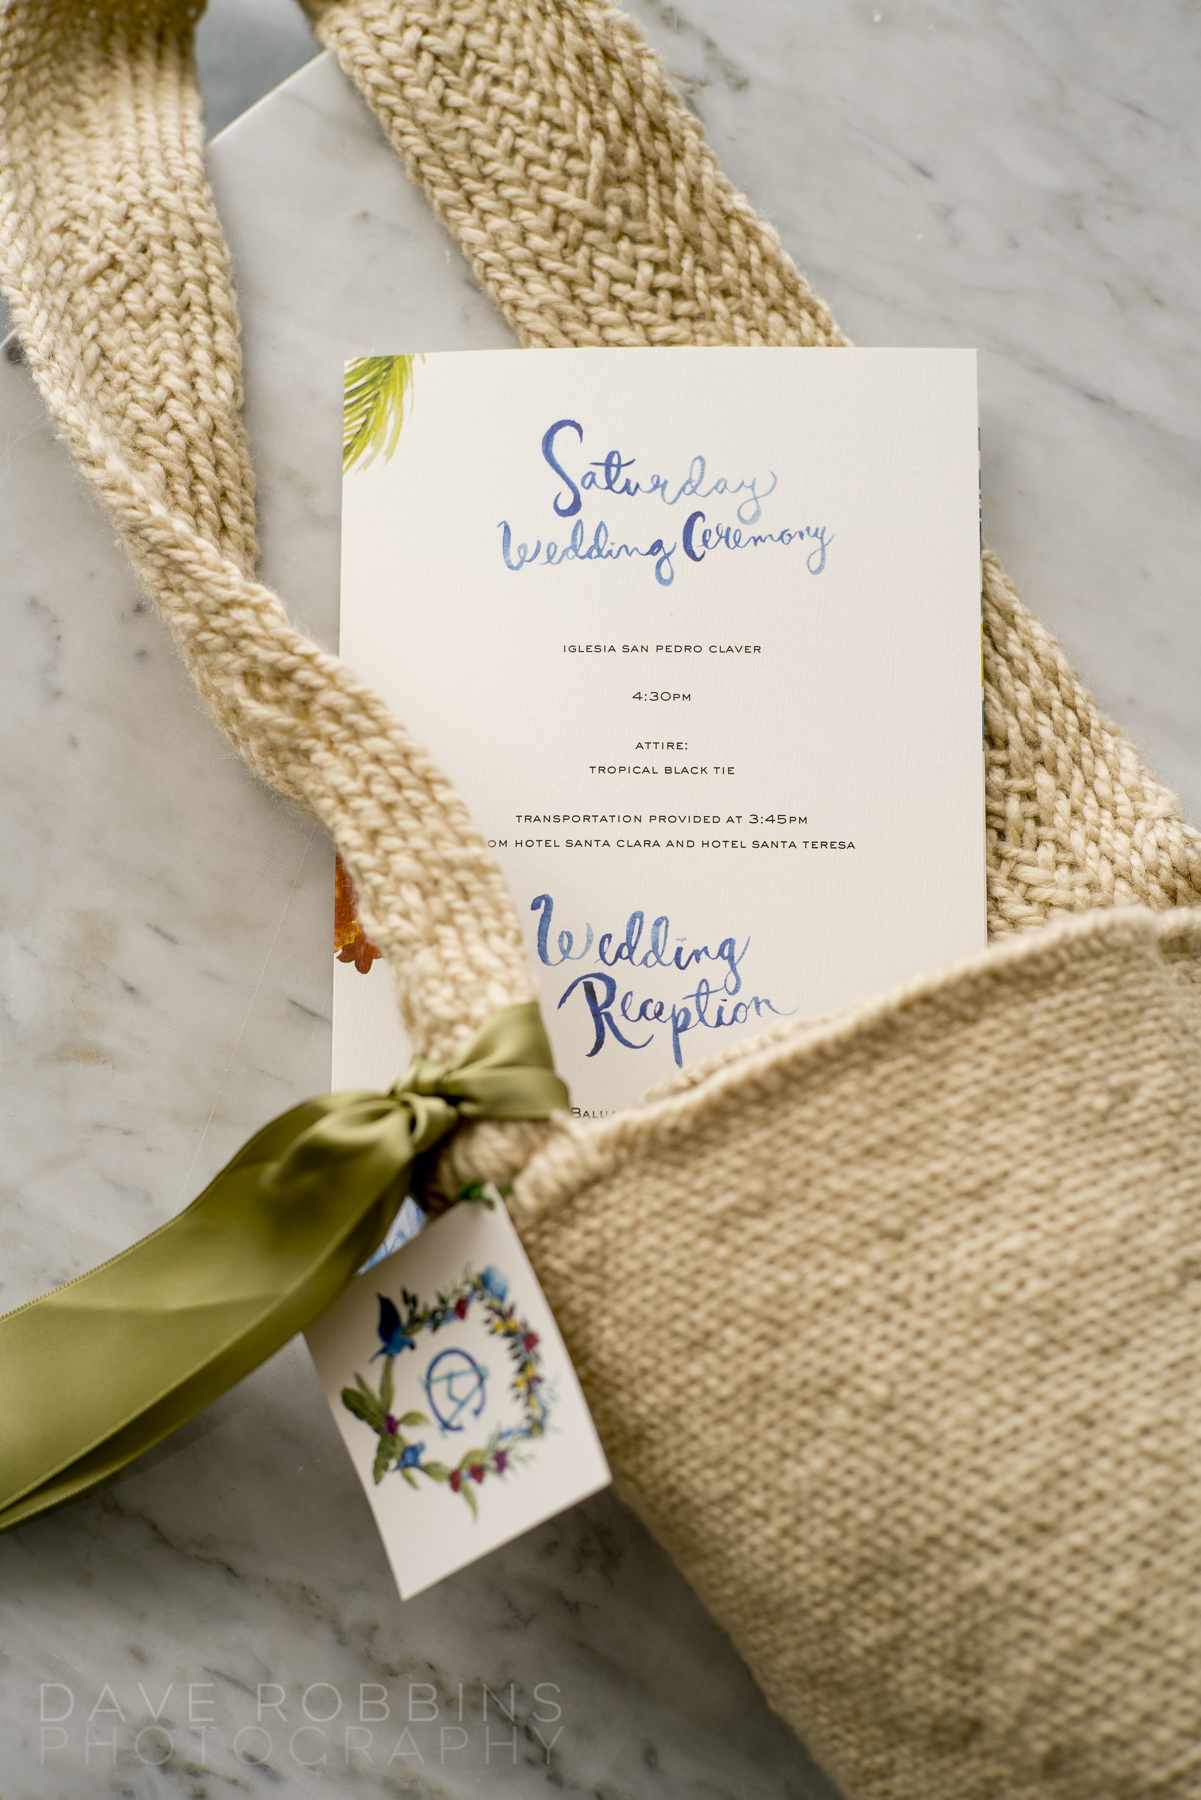 CARTAGENA WEDDING MARTHA STEWART - 0001.JPG